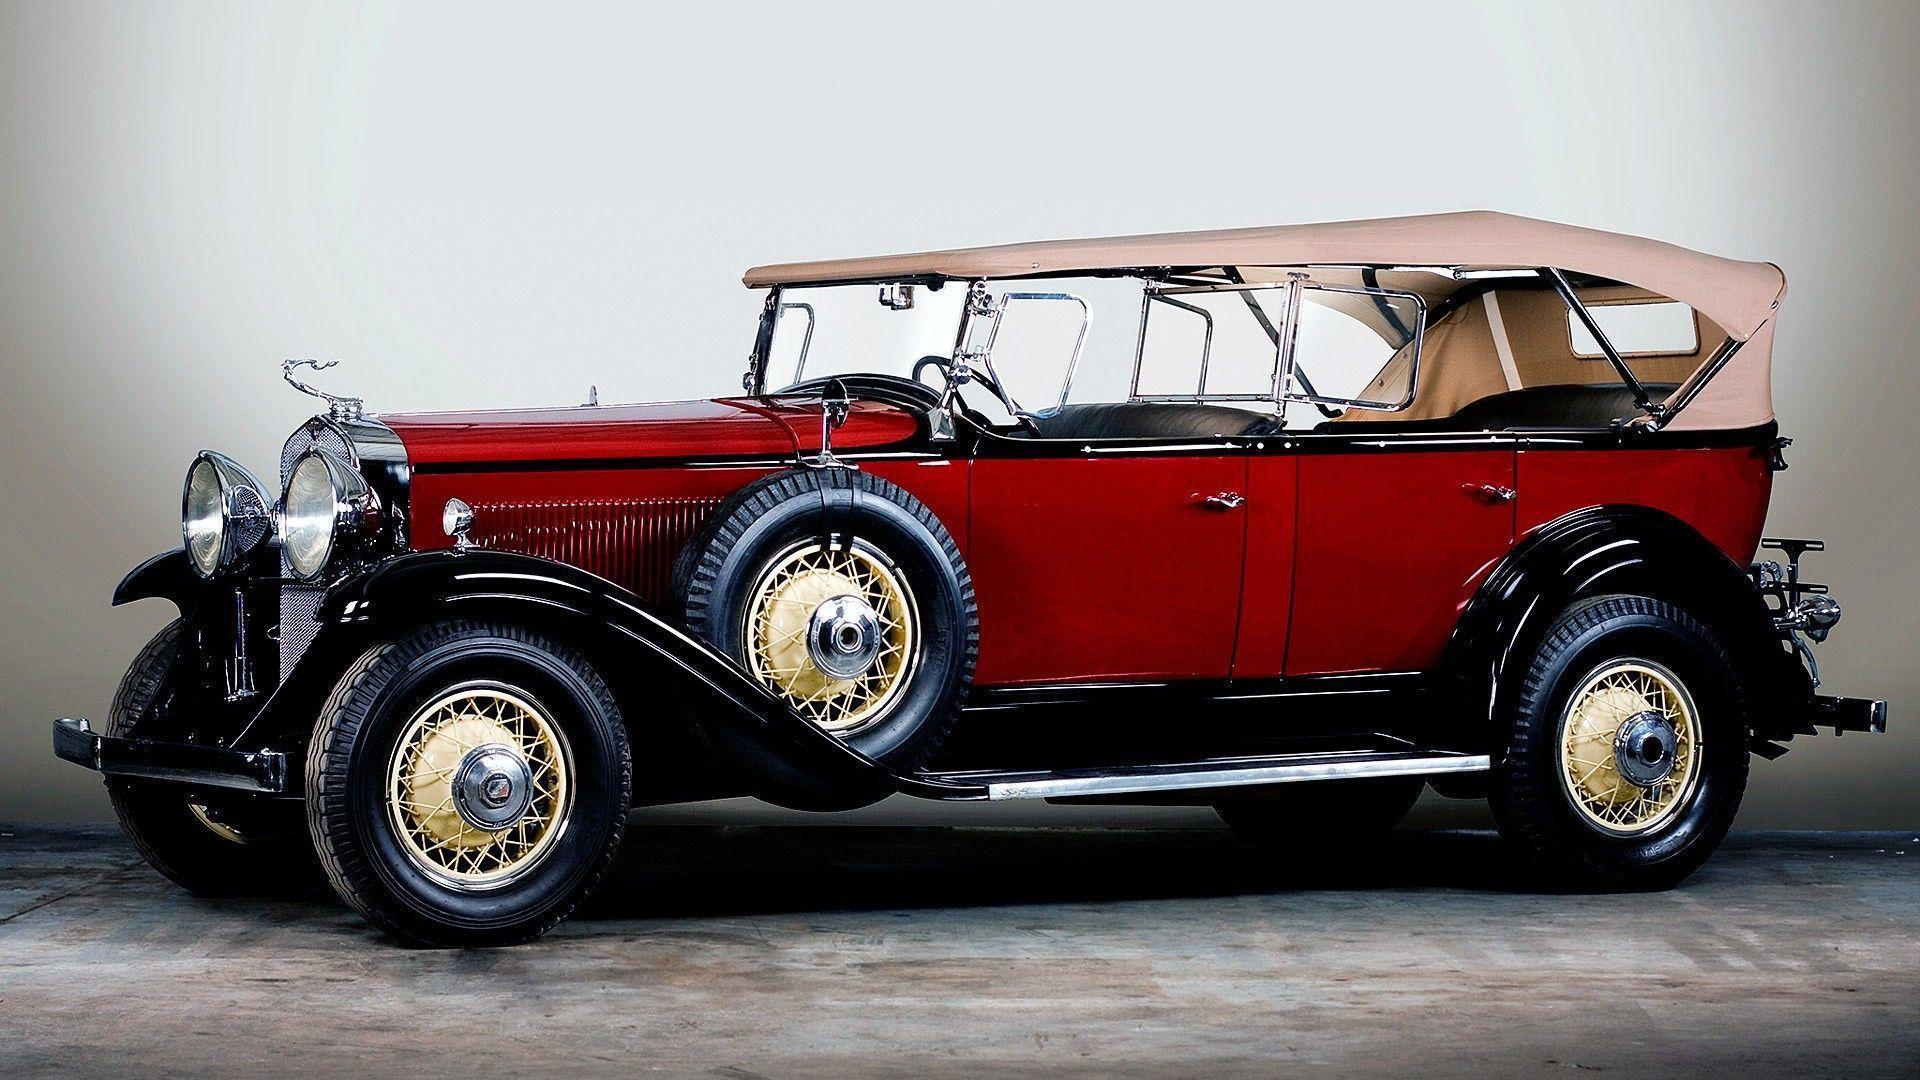 Classic Car Wallpaper HD | Free HD Desktop Wallpaper | Viewhdwall.